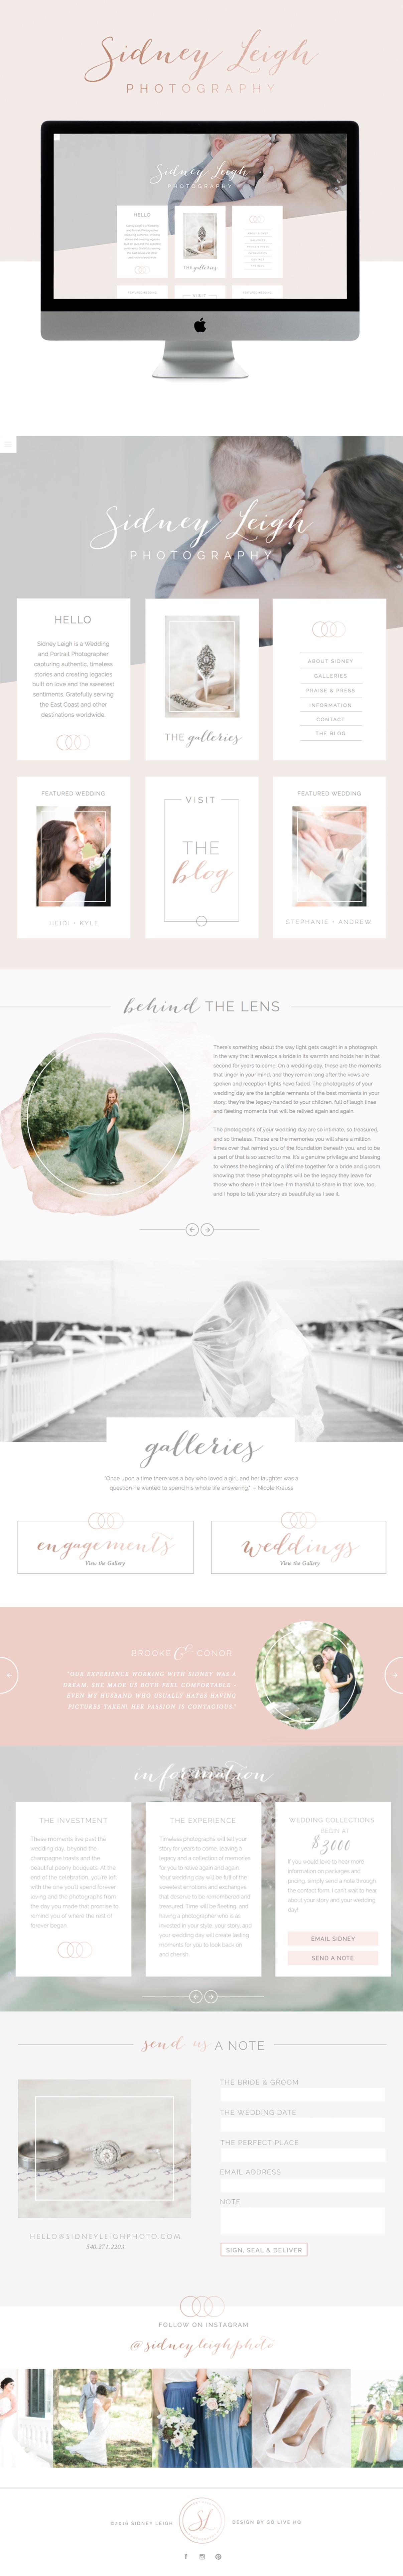 light and timeless squarespace website design | design by; golivehq.co